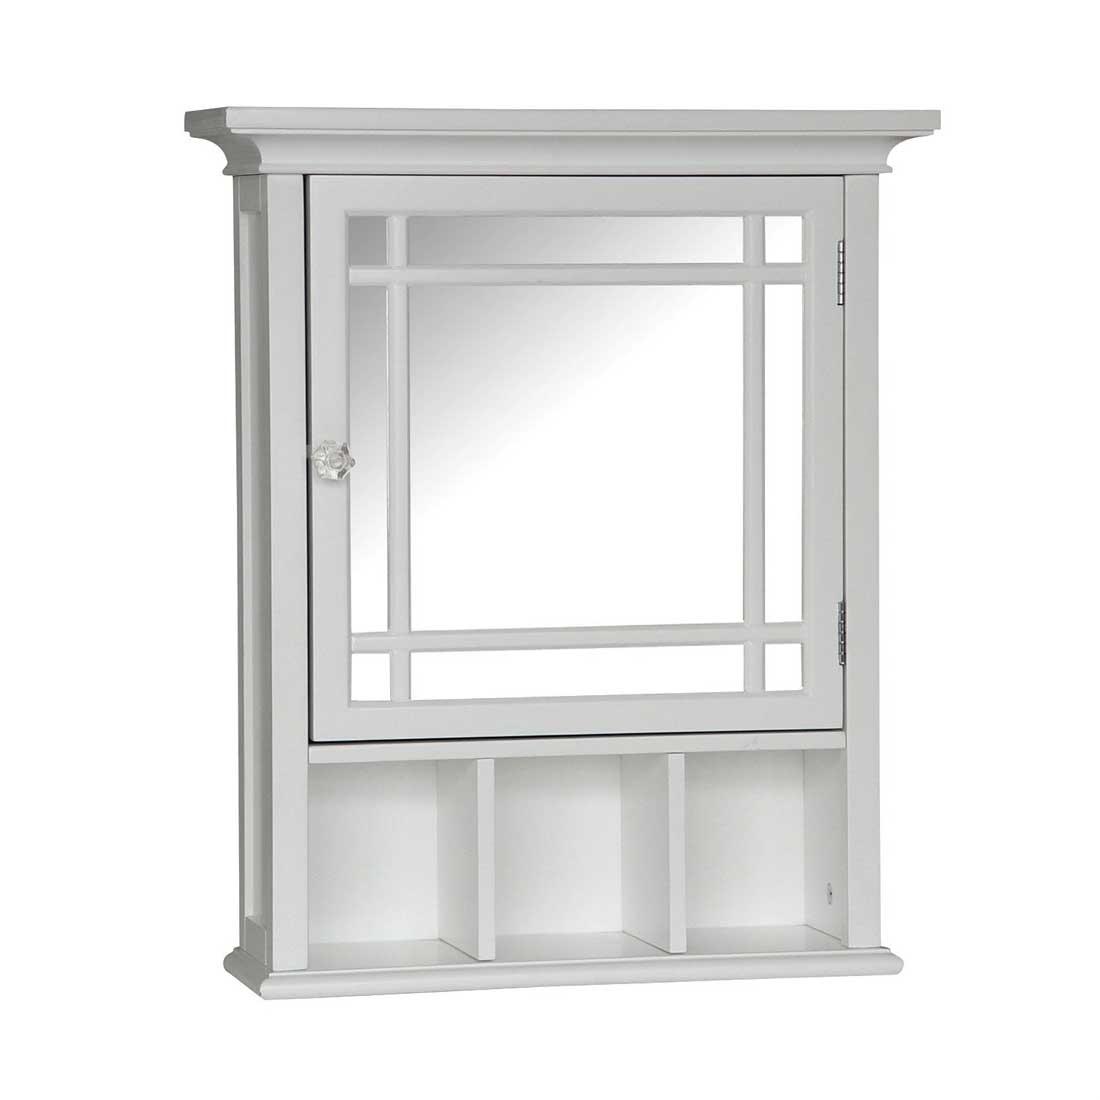 Single Mirror Bathroom Cabinet With Open Shelves